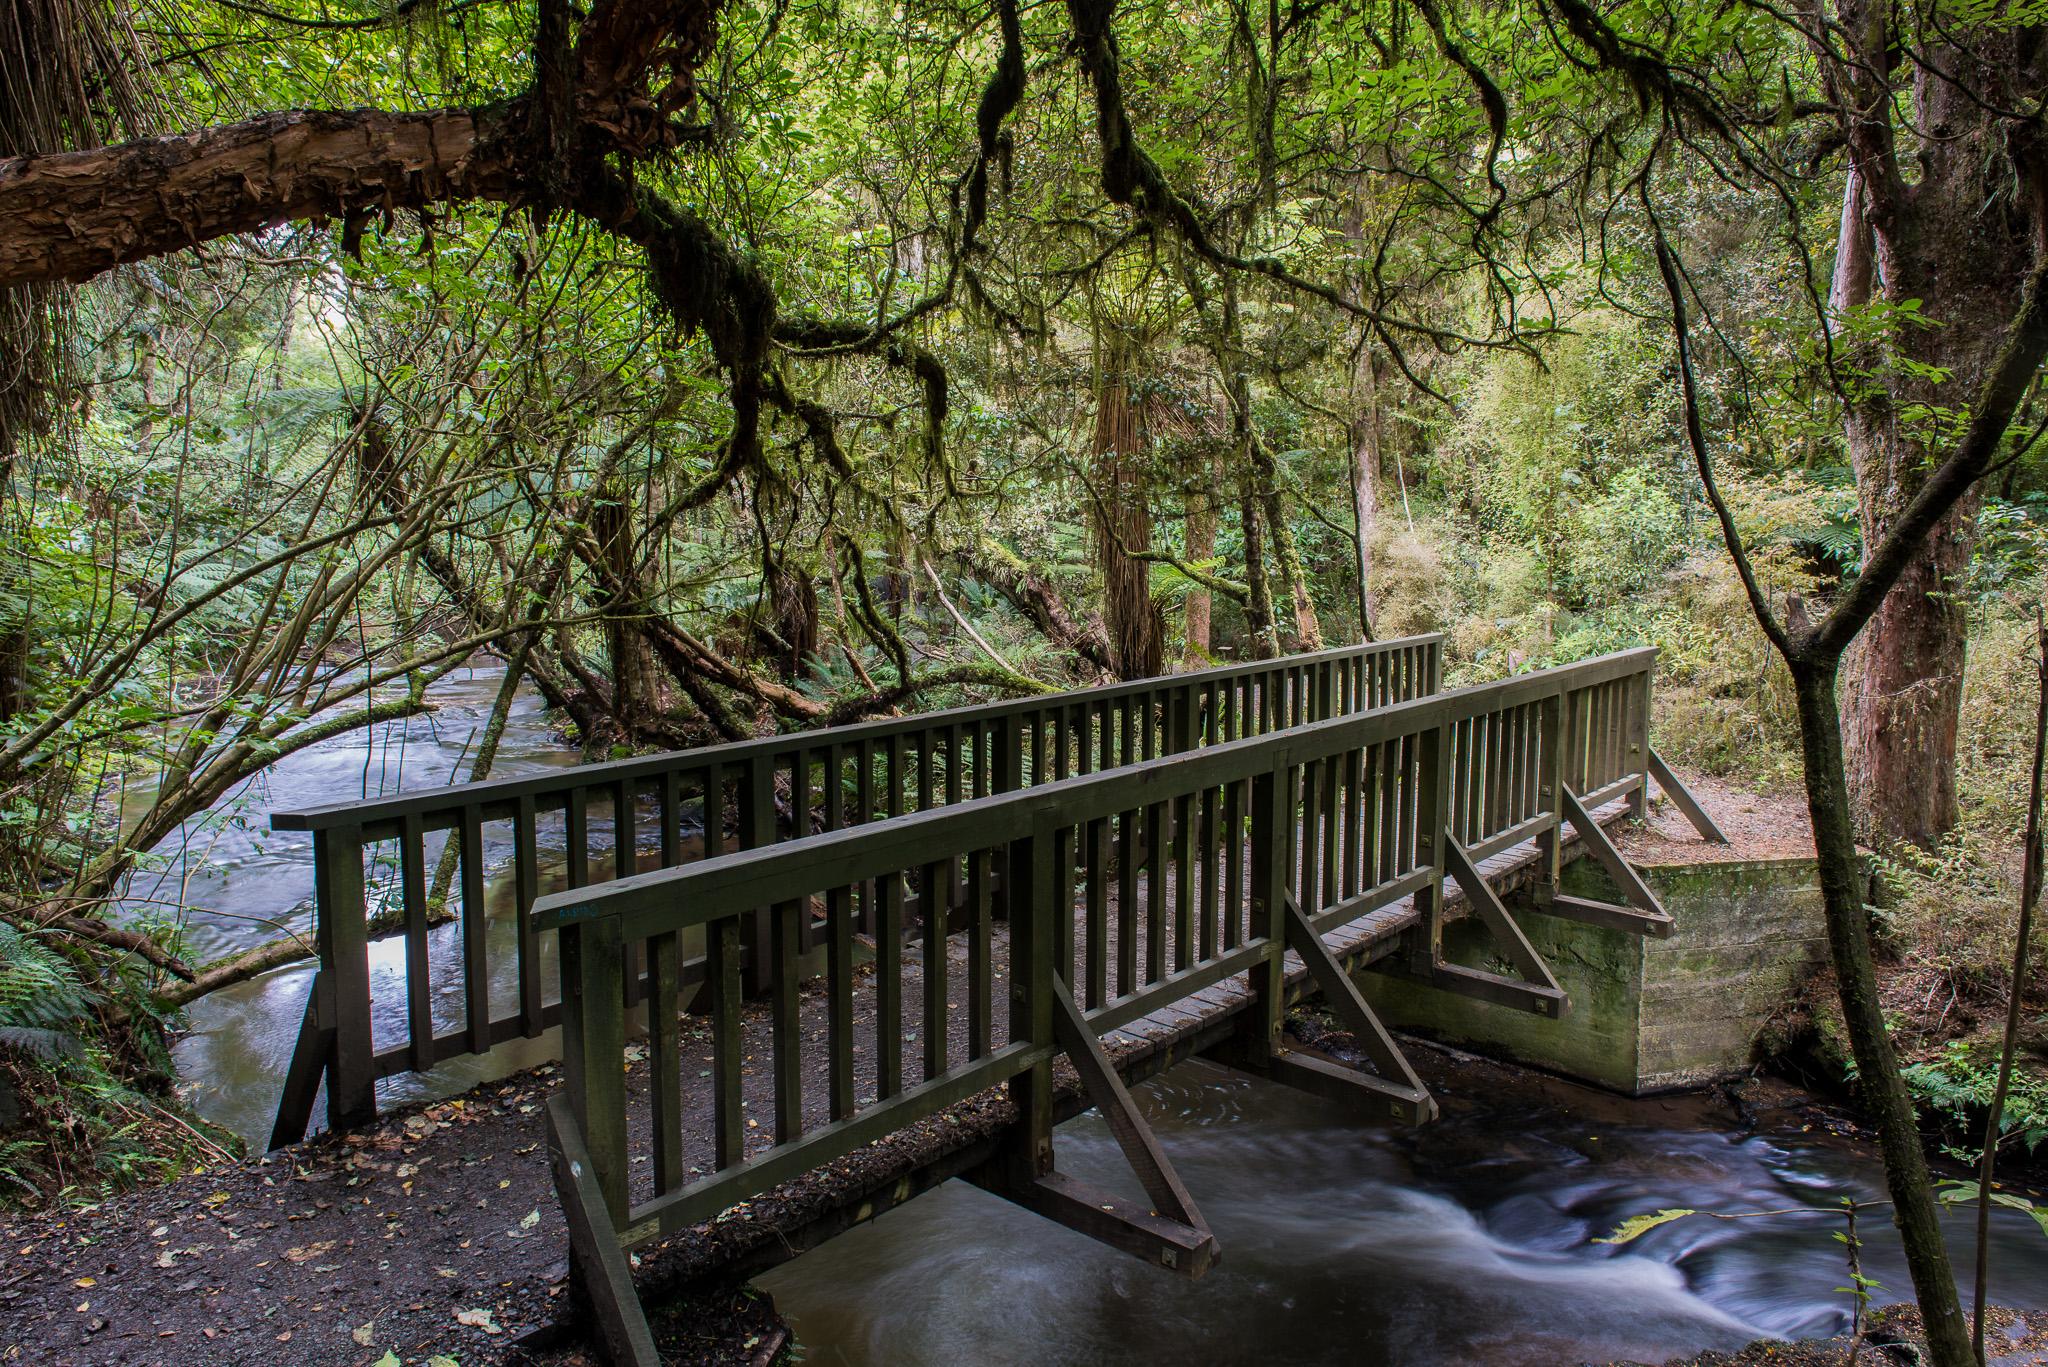 A Bridge, The Catlins, South Island, New Zealand